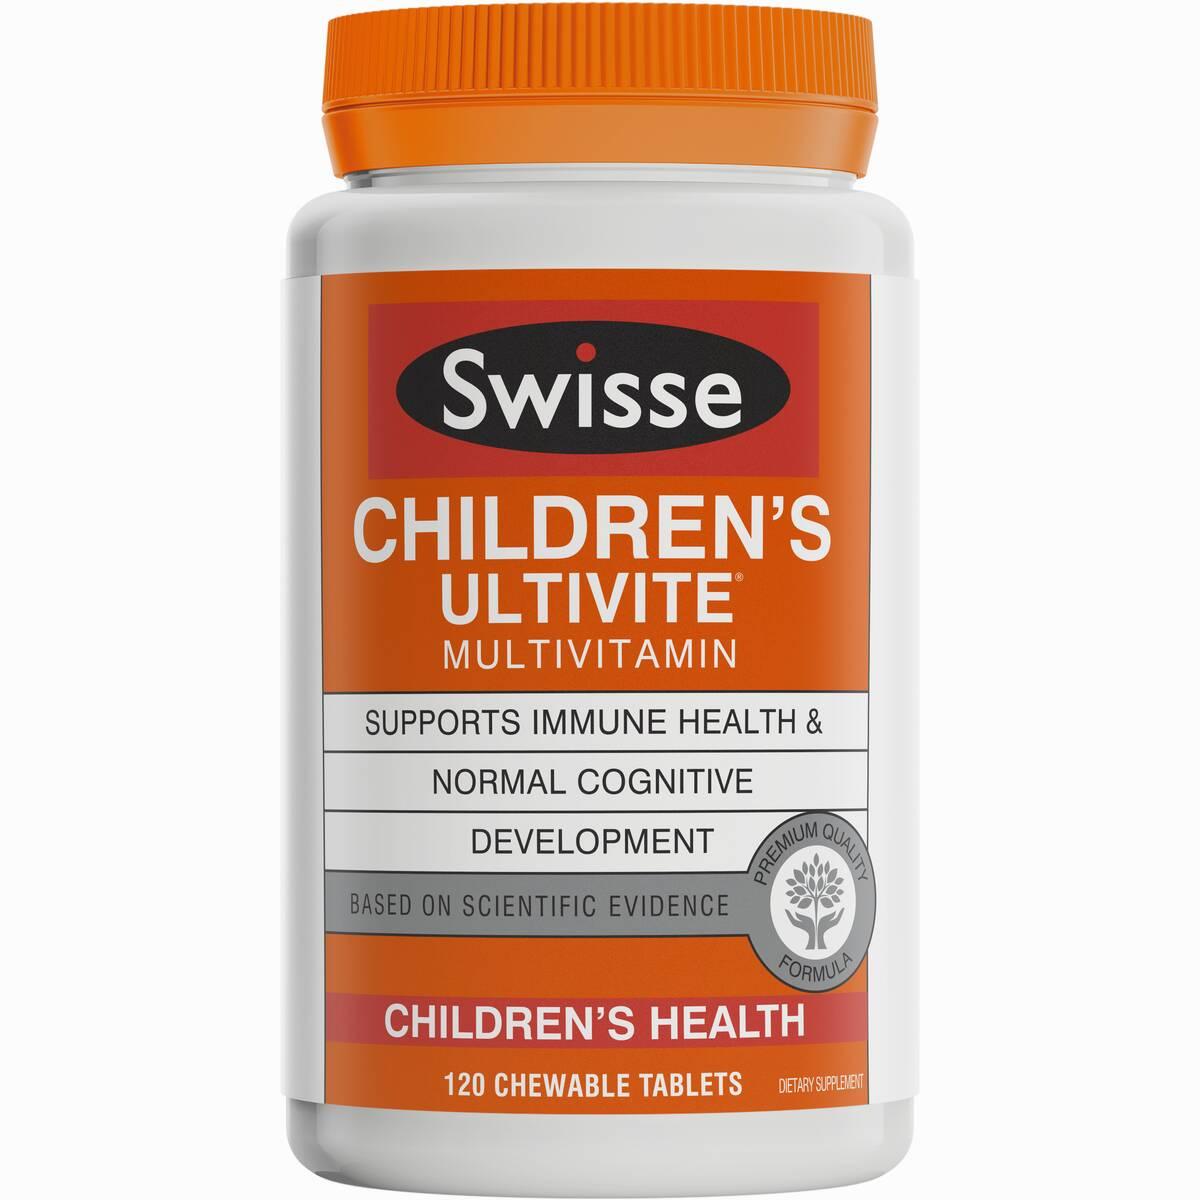 Swisse Childrens Ultivite 120 T